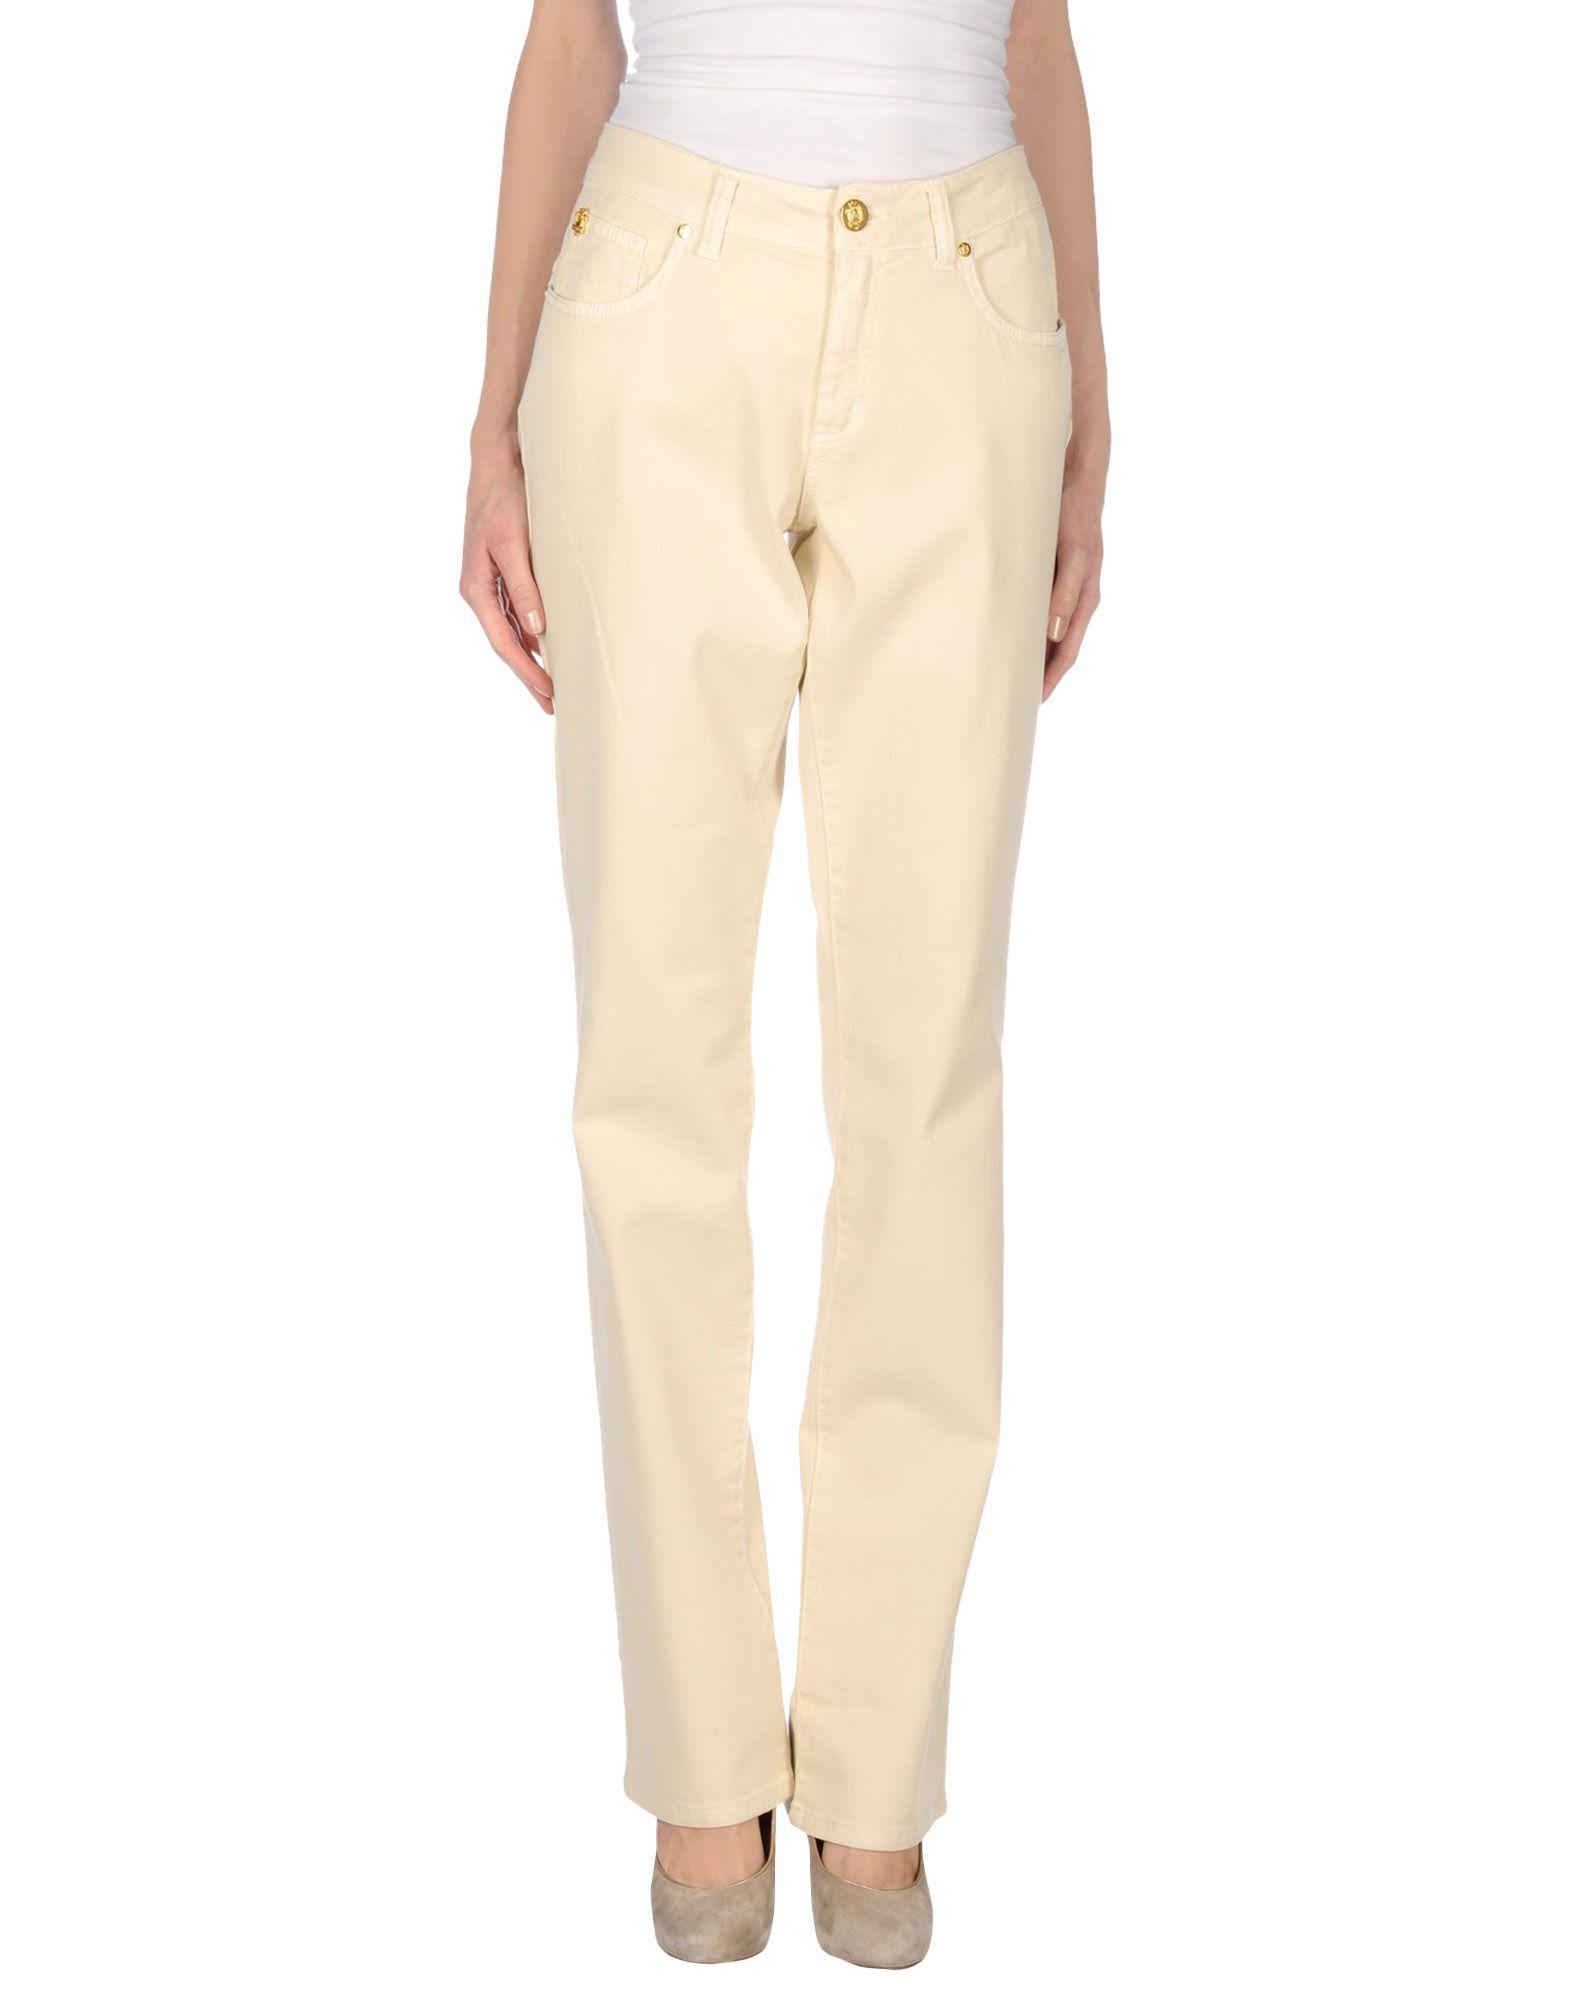 MARANI JEANS Damen Jeanshose Farbe Beige Größe 2